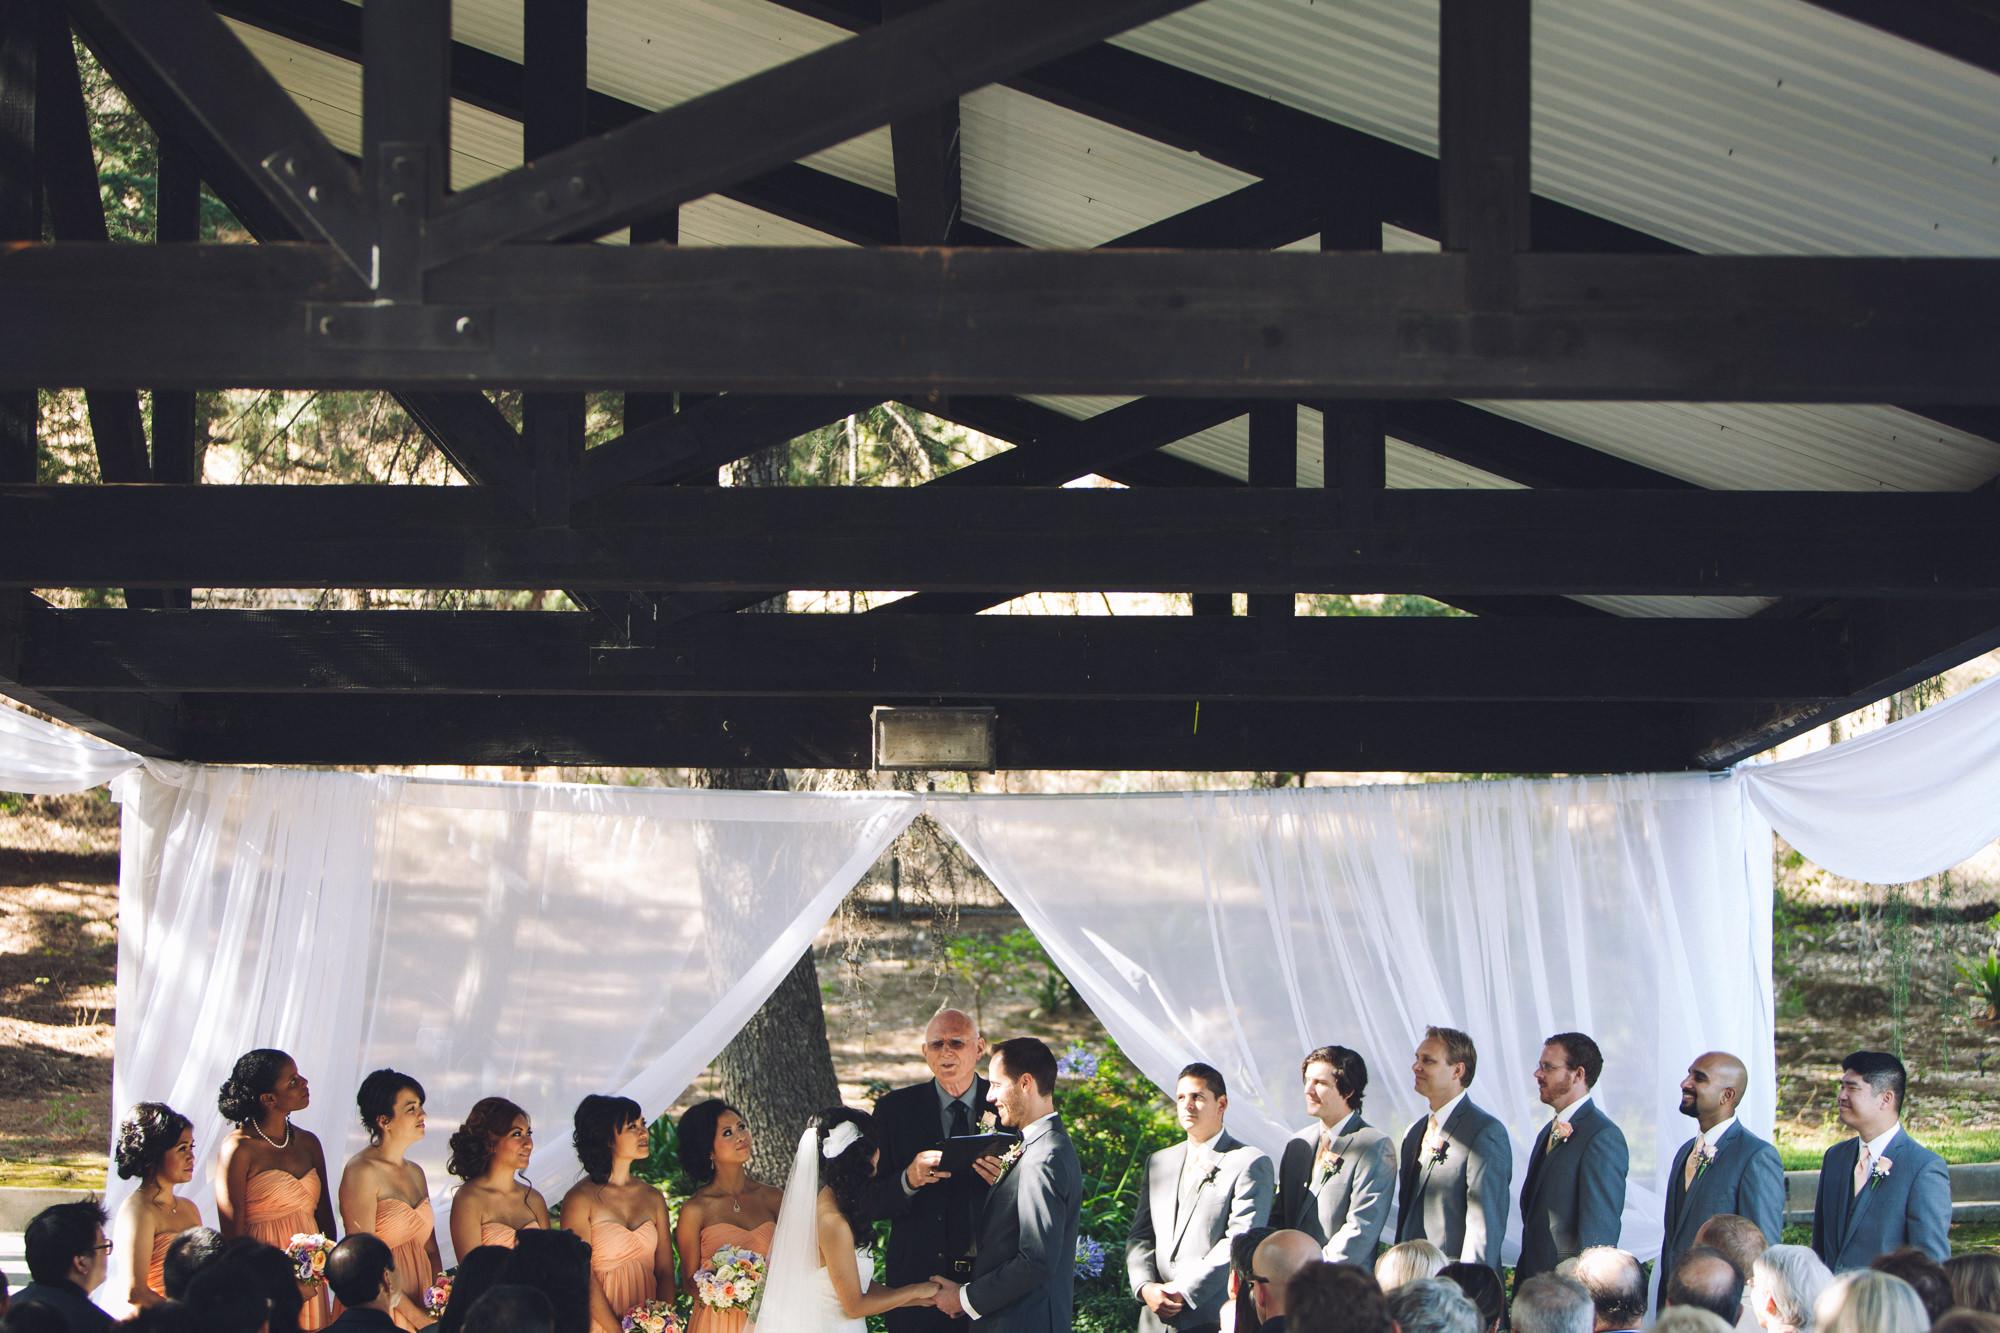 Alice_&_Aaron_Wedding_by_The_Light_&_Glass_Photography-068.jpg